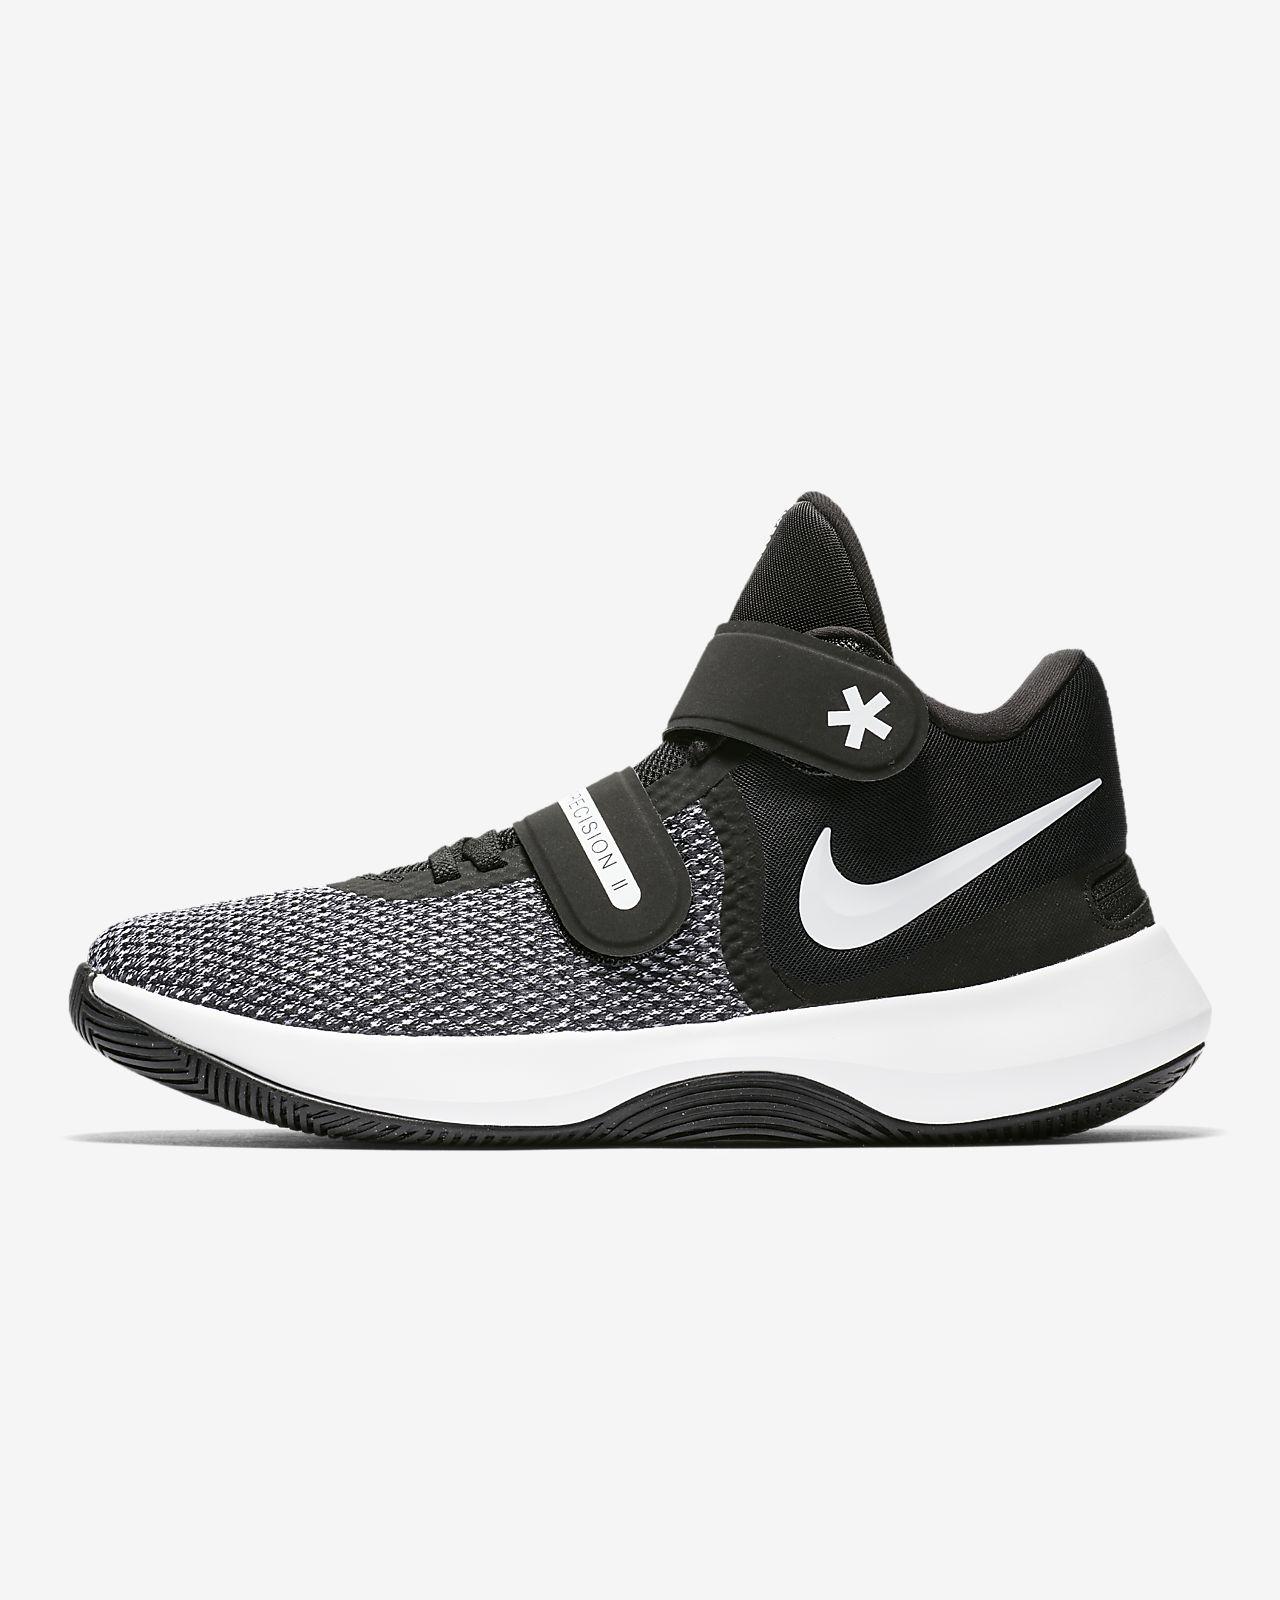 Nike Air Precision II FlyEase Men's Basketball Shoe